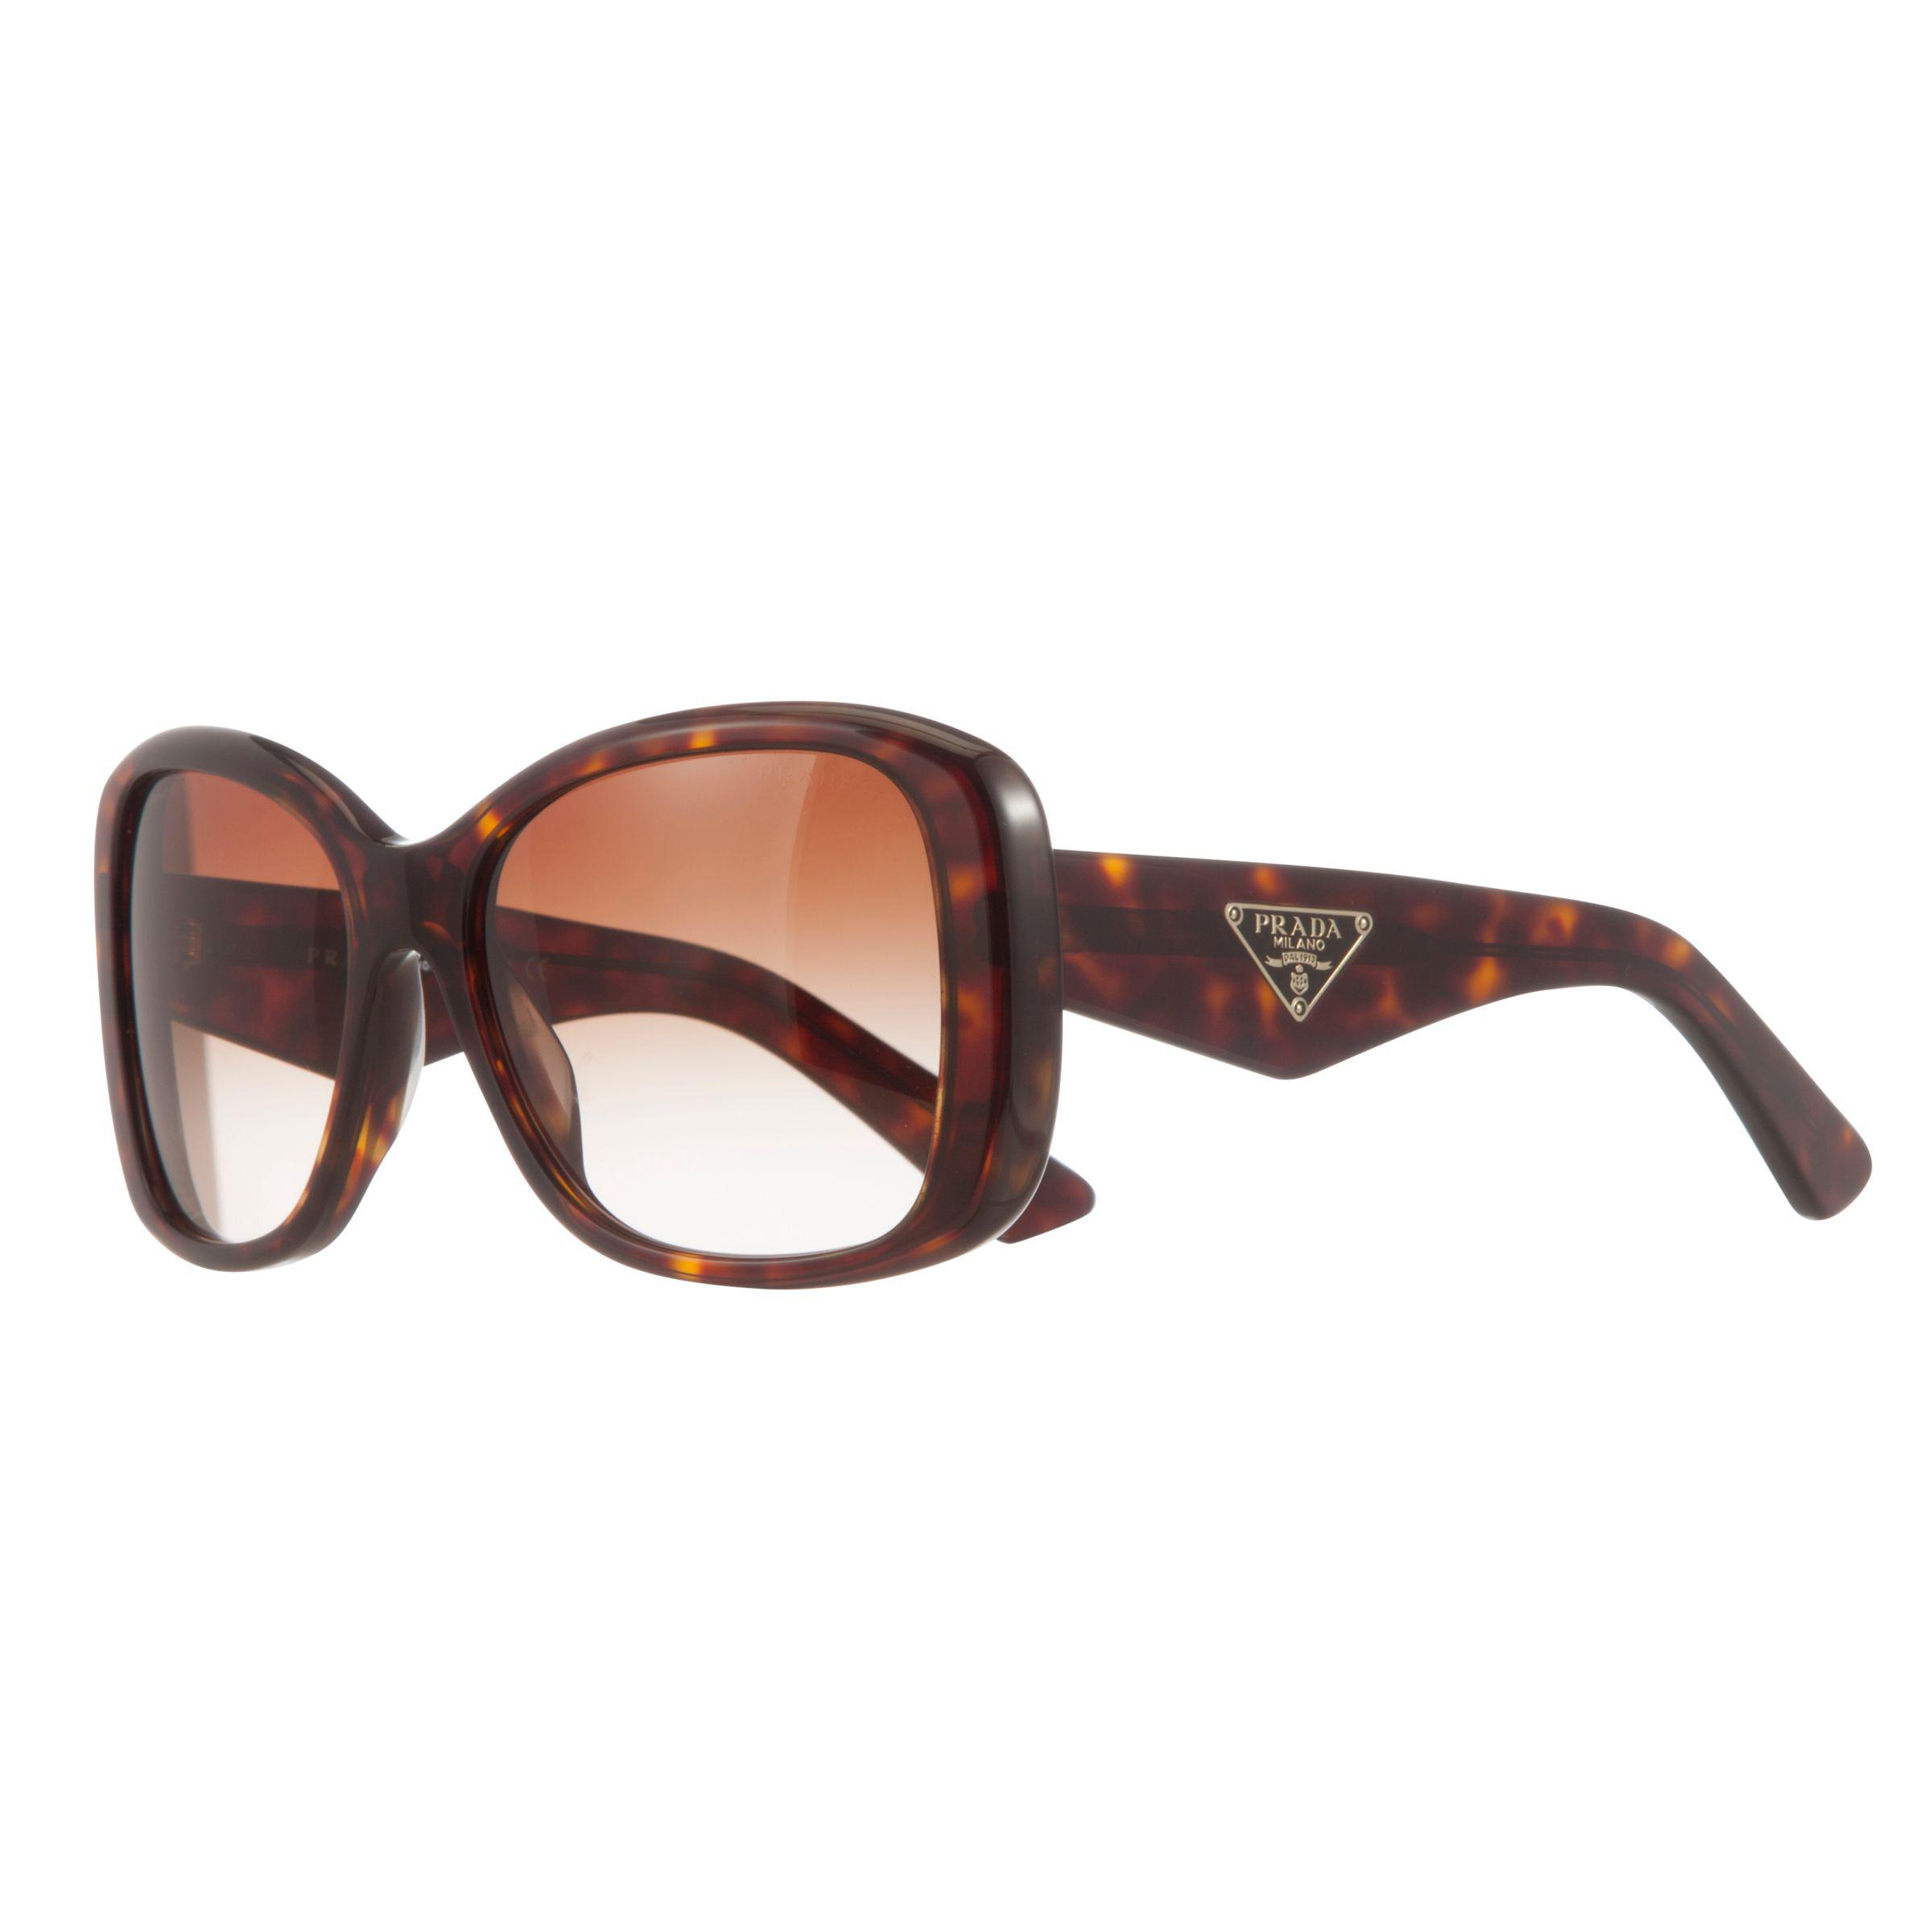 ff664aaf0d Prada Pr32ps Square Framed Polarised Sunglasses in Brown - Lyst